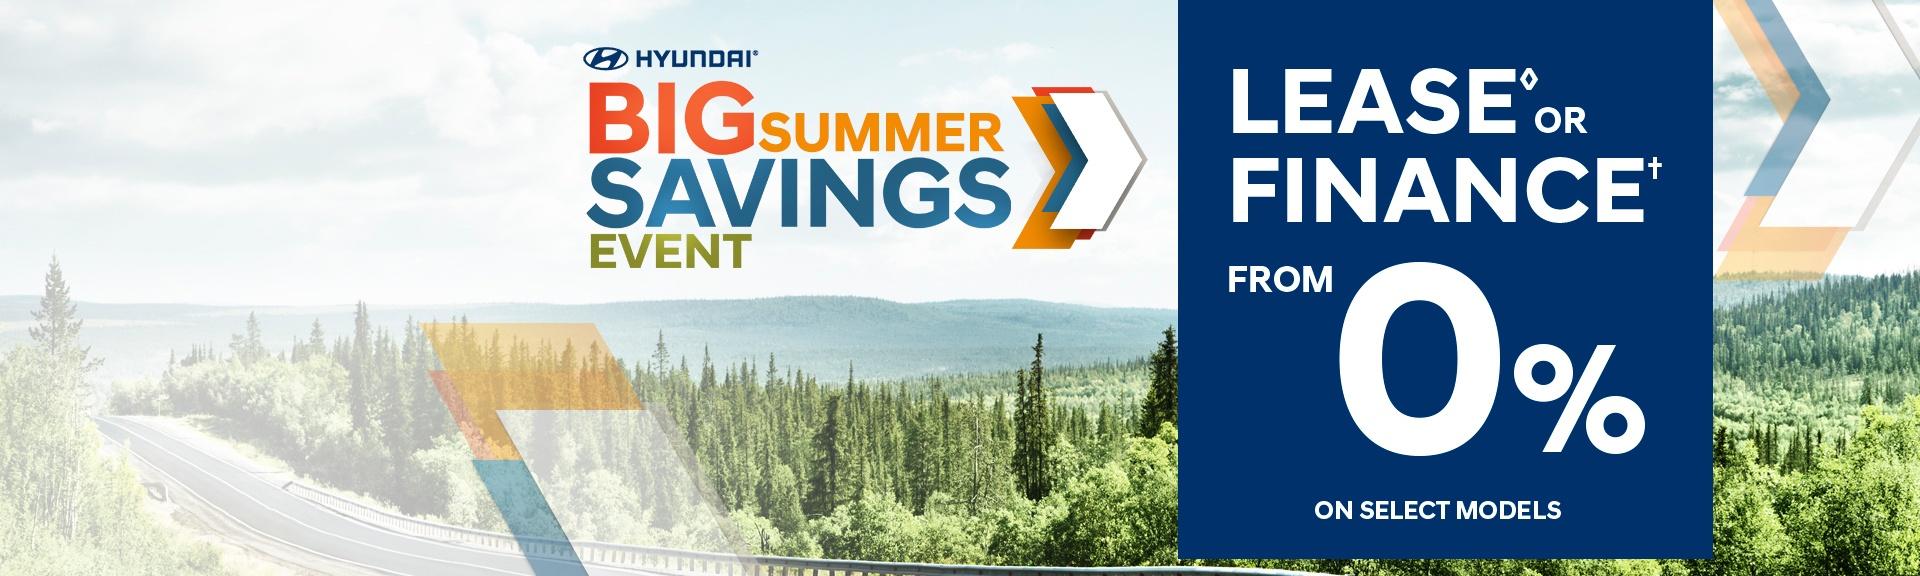 Hyundai-Big-Saving-Event-Banner